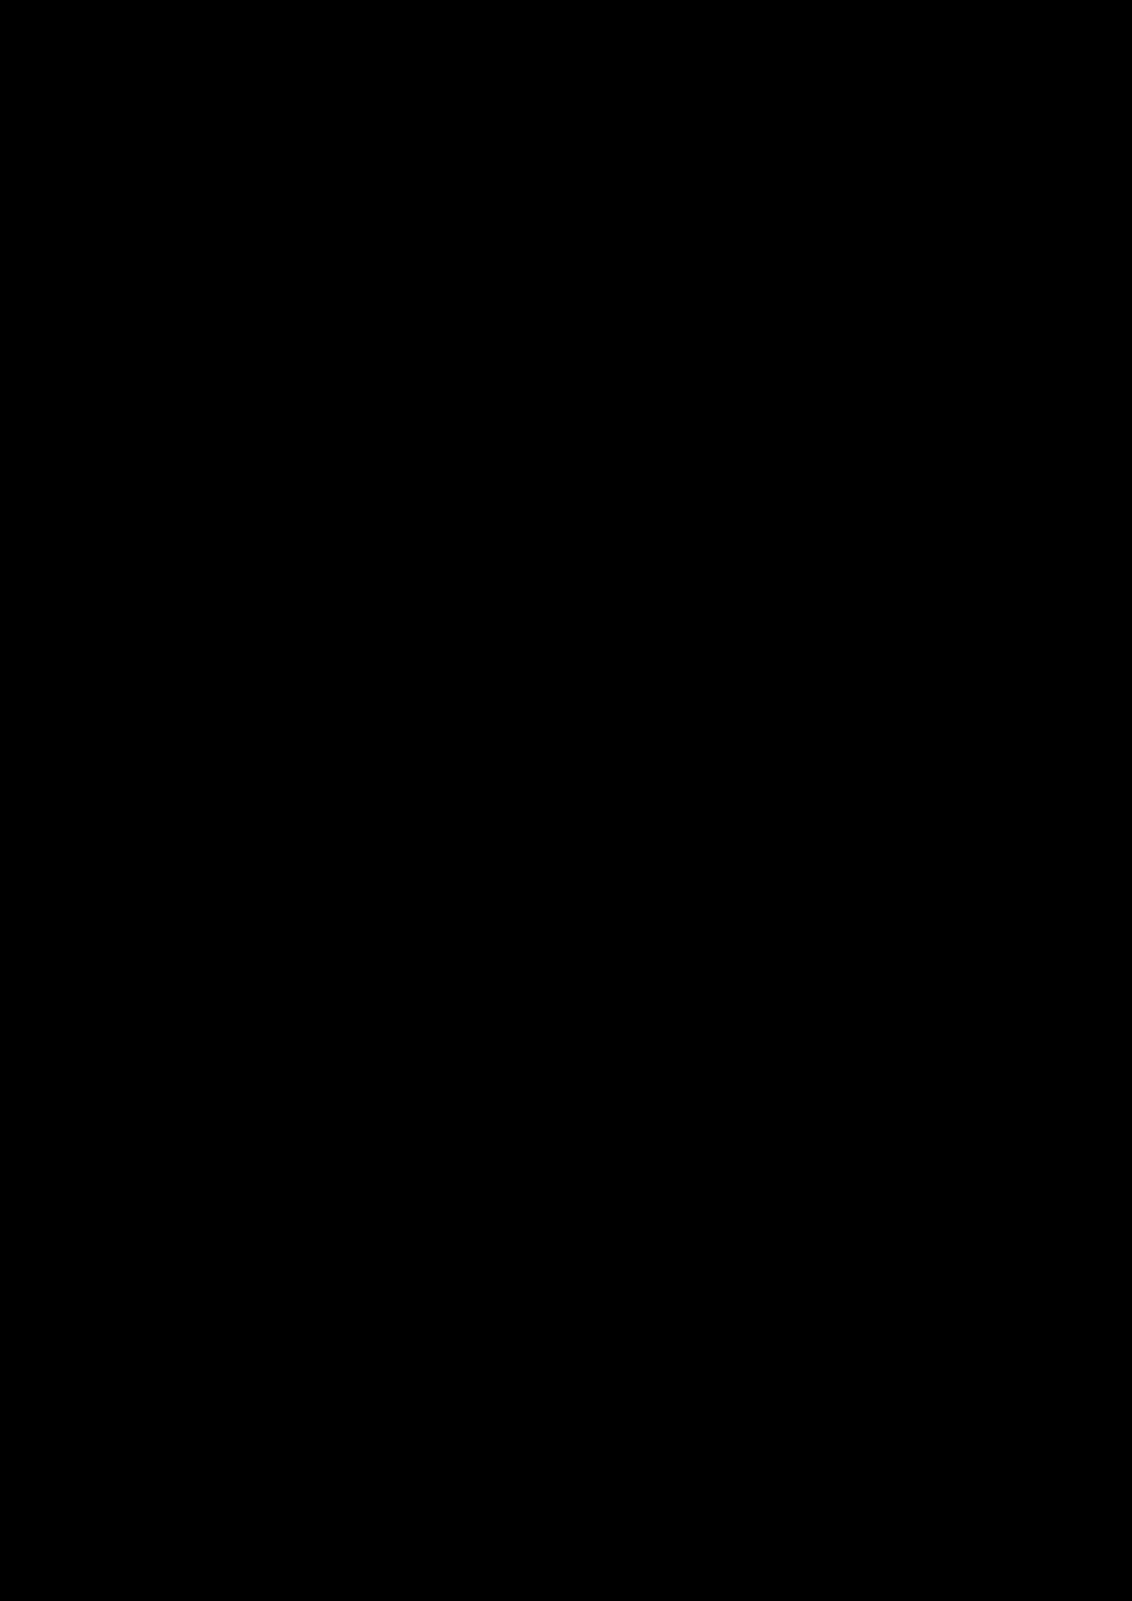 18 berez slide, Image 1